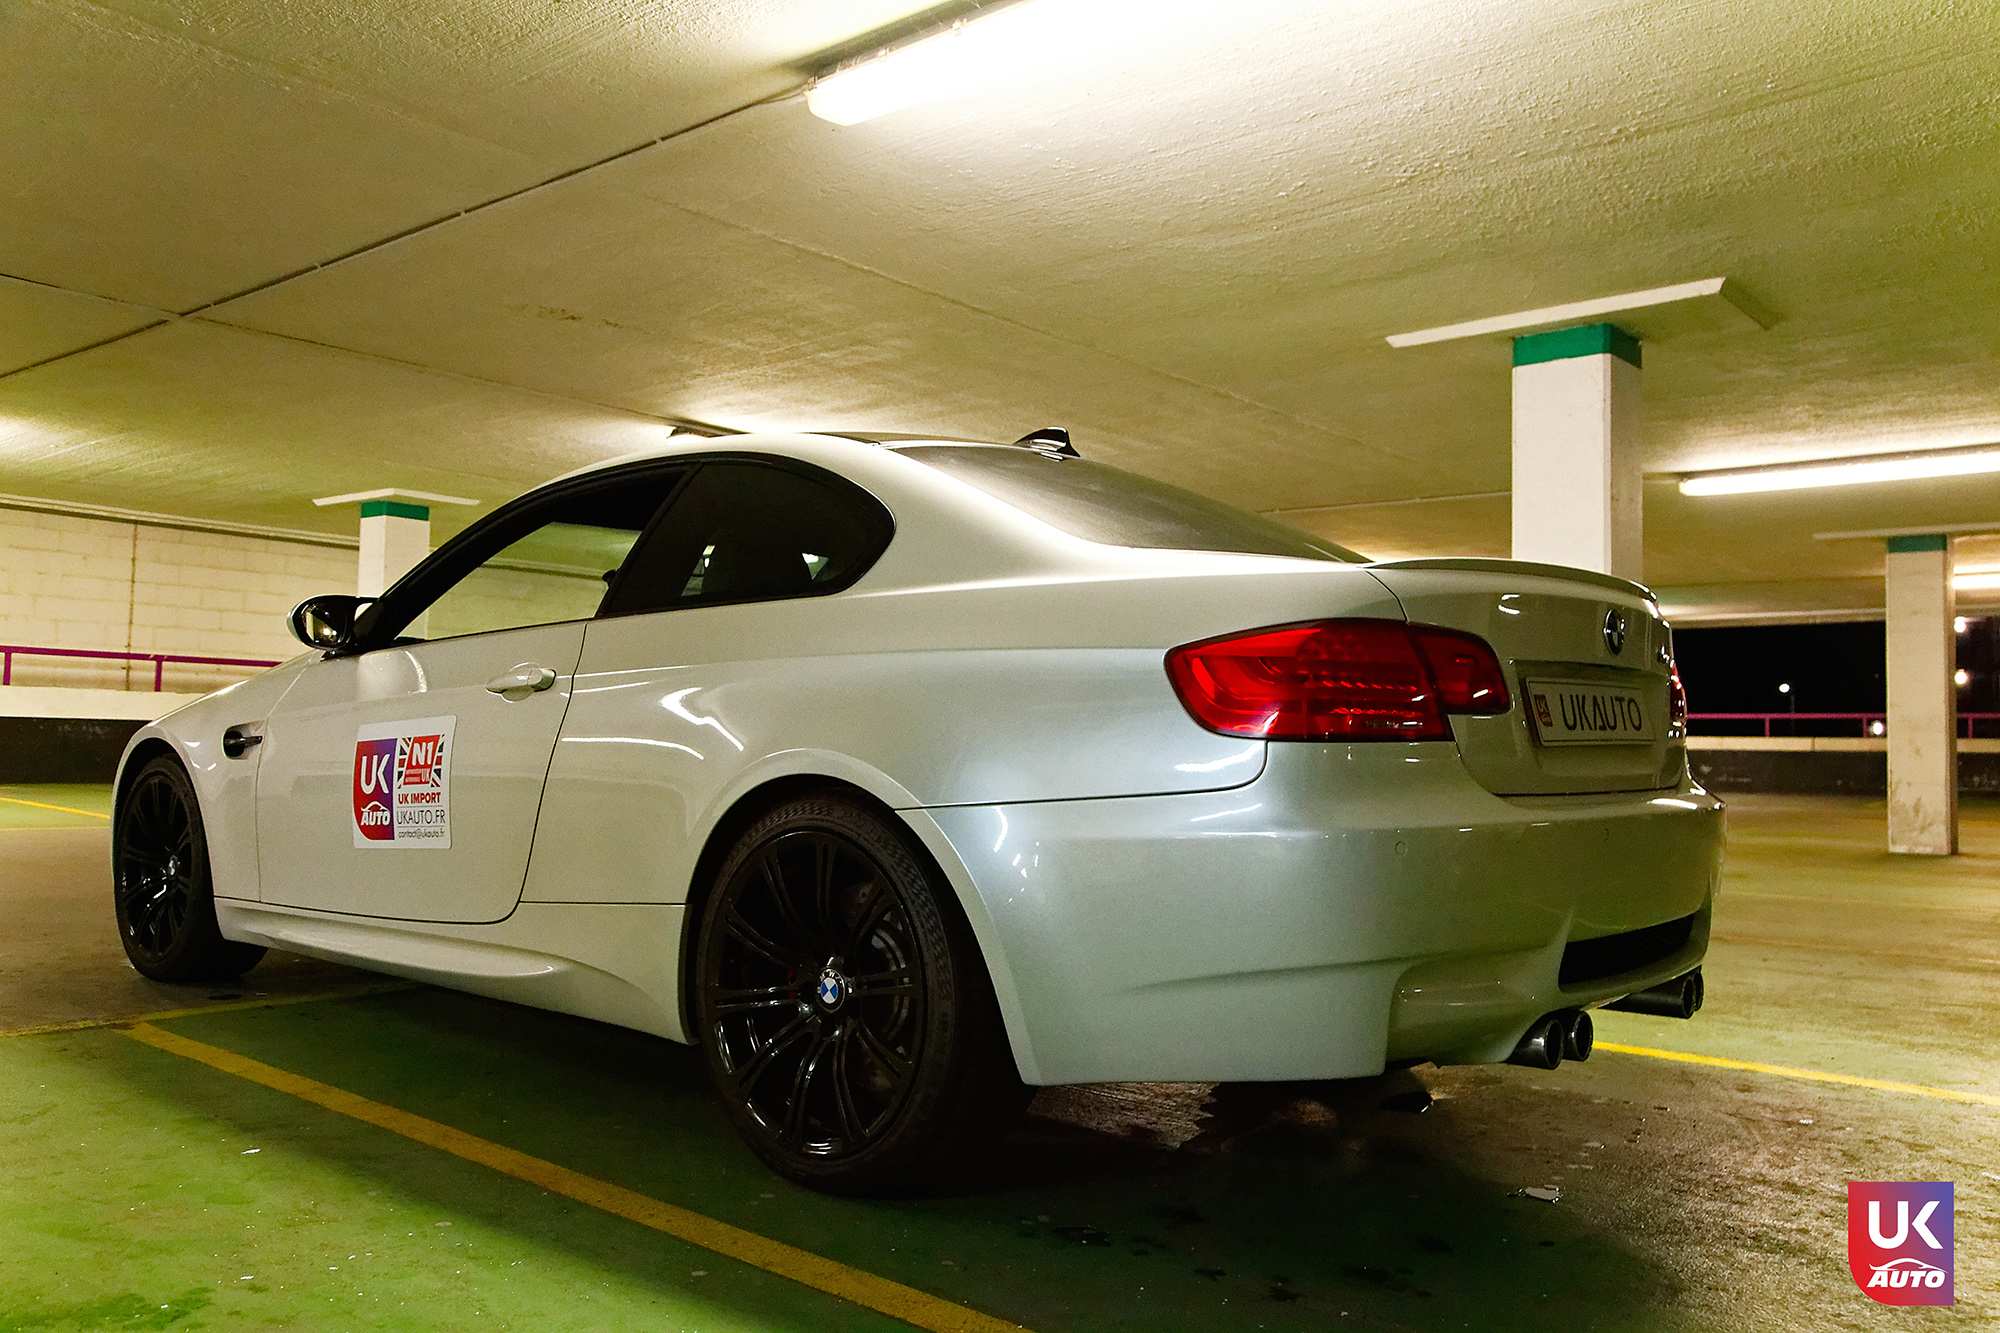 BMW m3 E92 import auto mandataire angleterre uk londres bmw leboncoin achat angleterre bmw voiture anglaise auto rhd e92 uk auto2 - Felecitation a Clement pour cette BMW M3 E92 COUPE RHD PACK CARBON BMW ANGLETERRE VOITURE UK